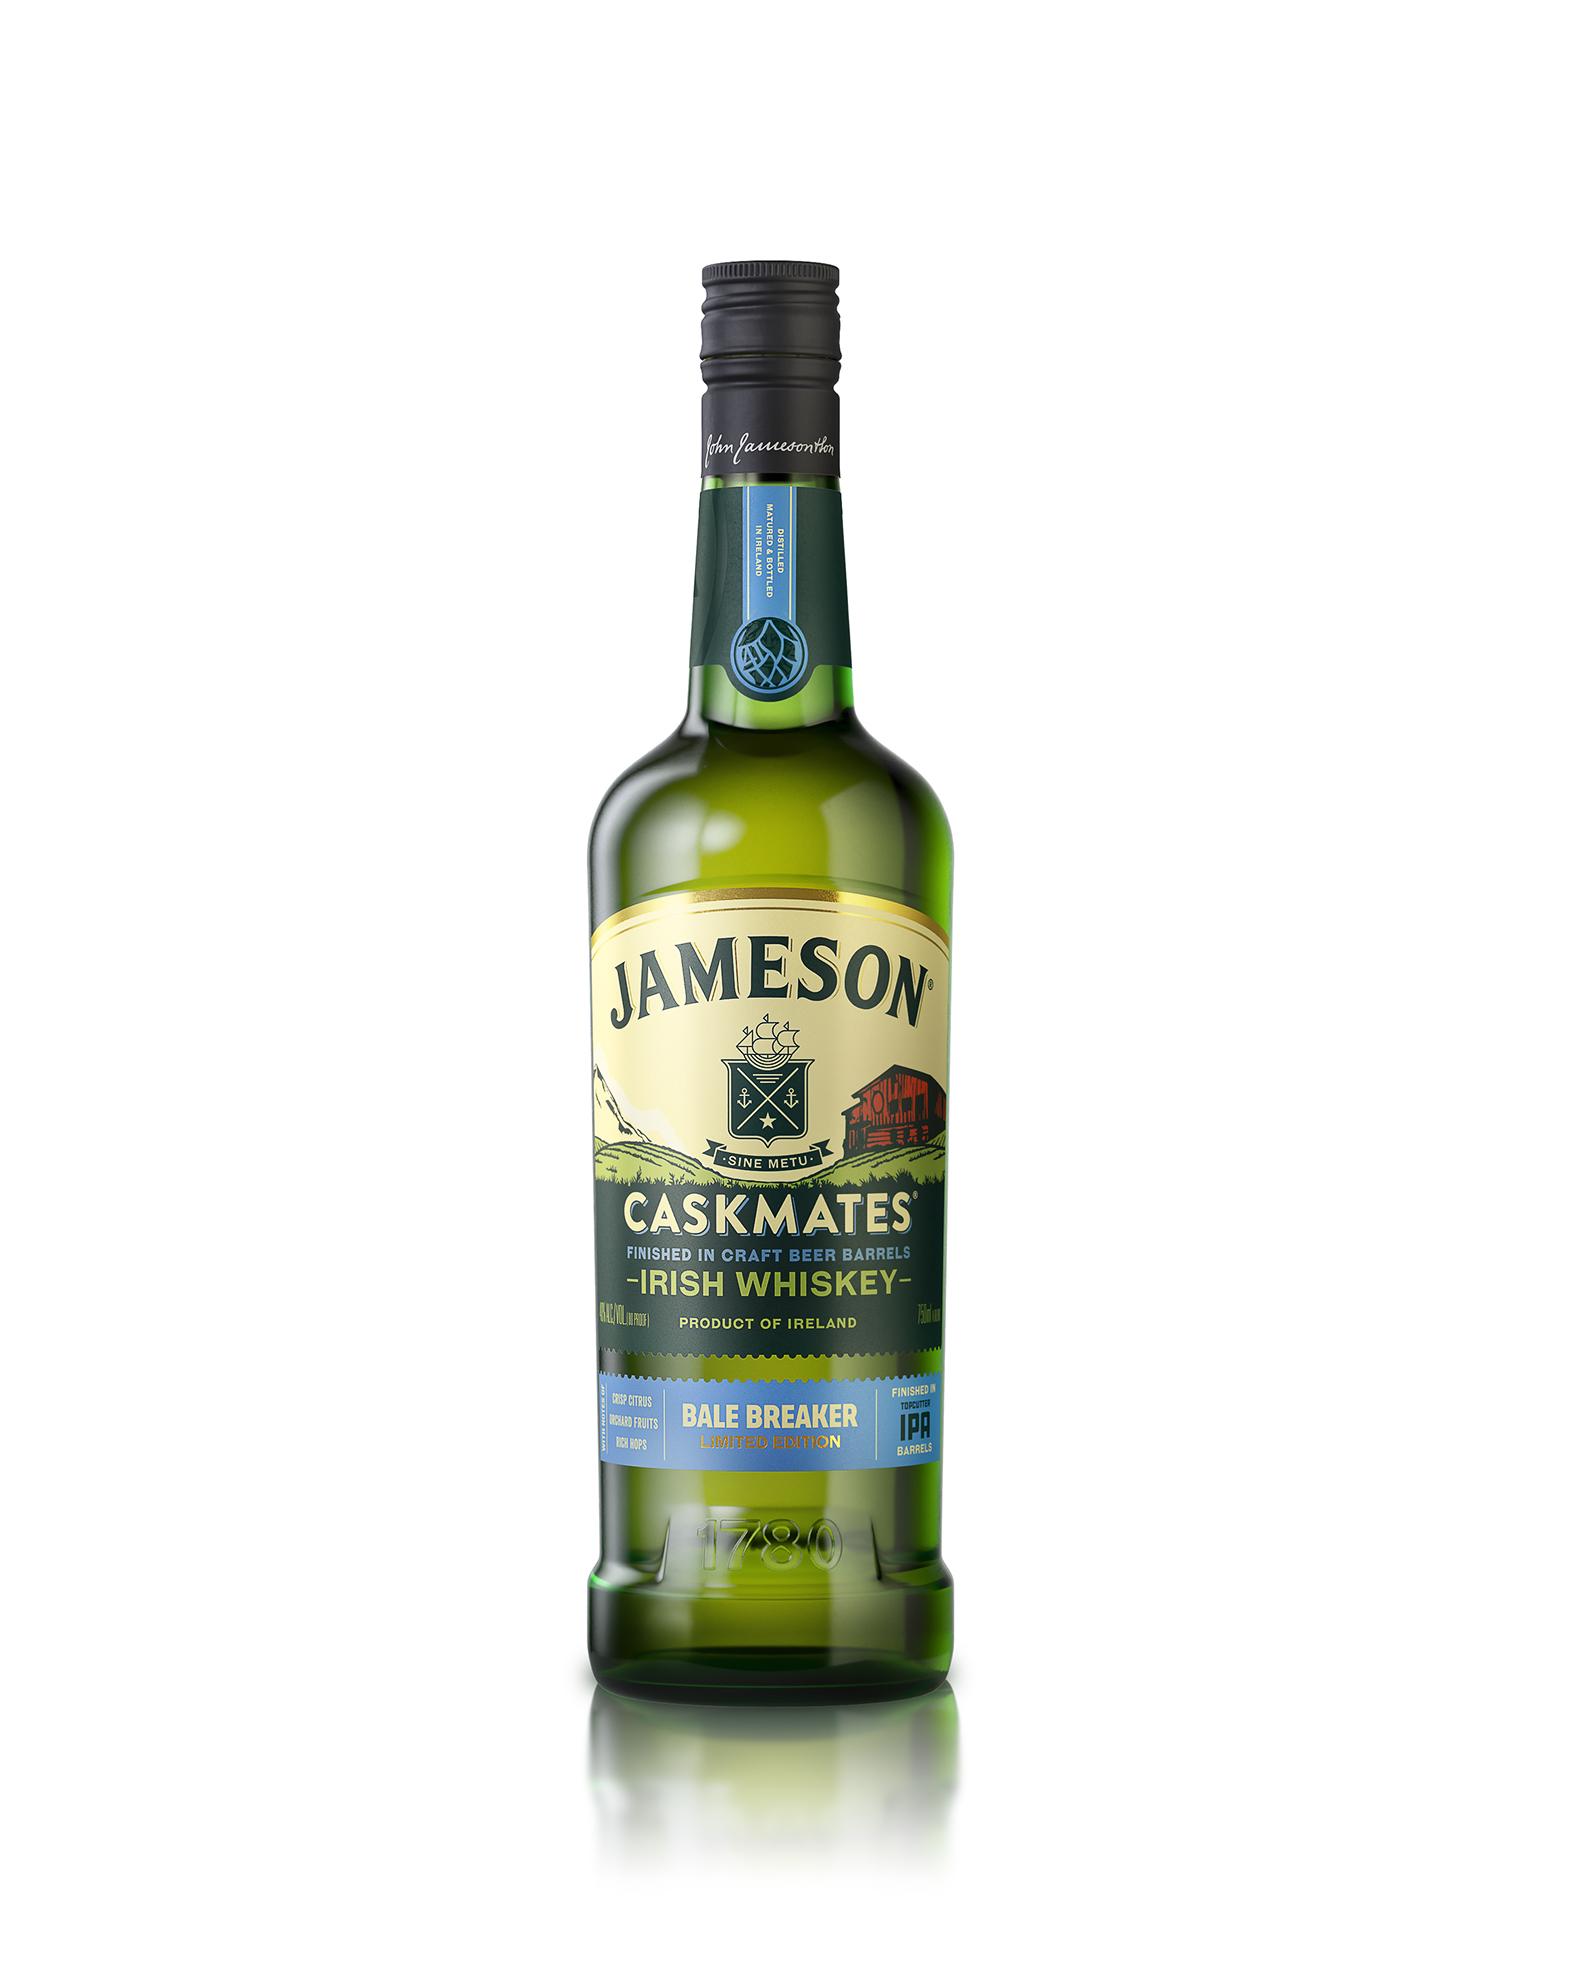 Jameson Caskmates Bale Breaker Edition